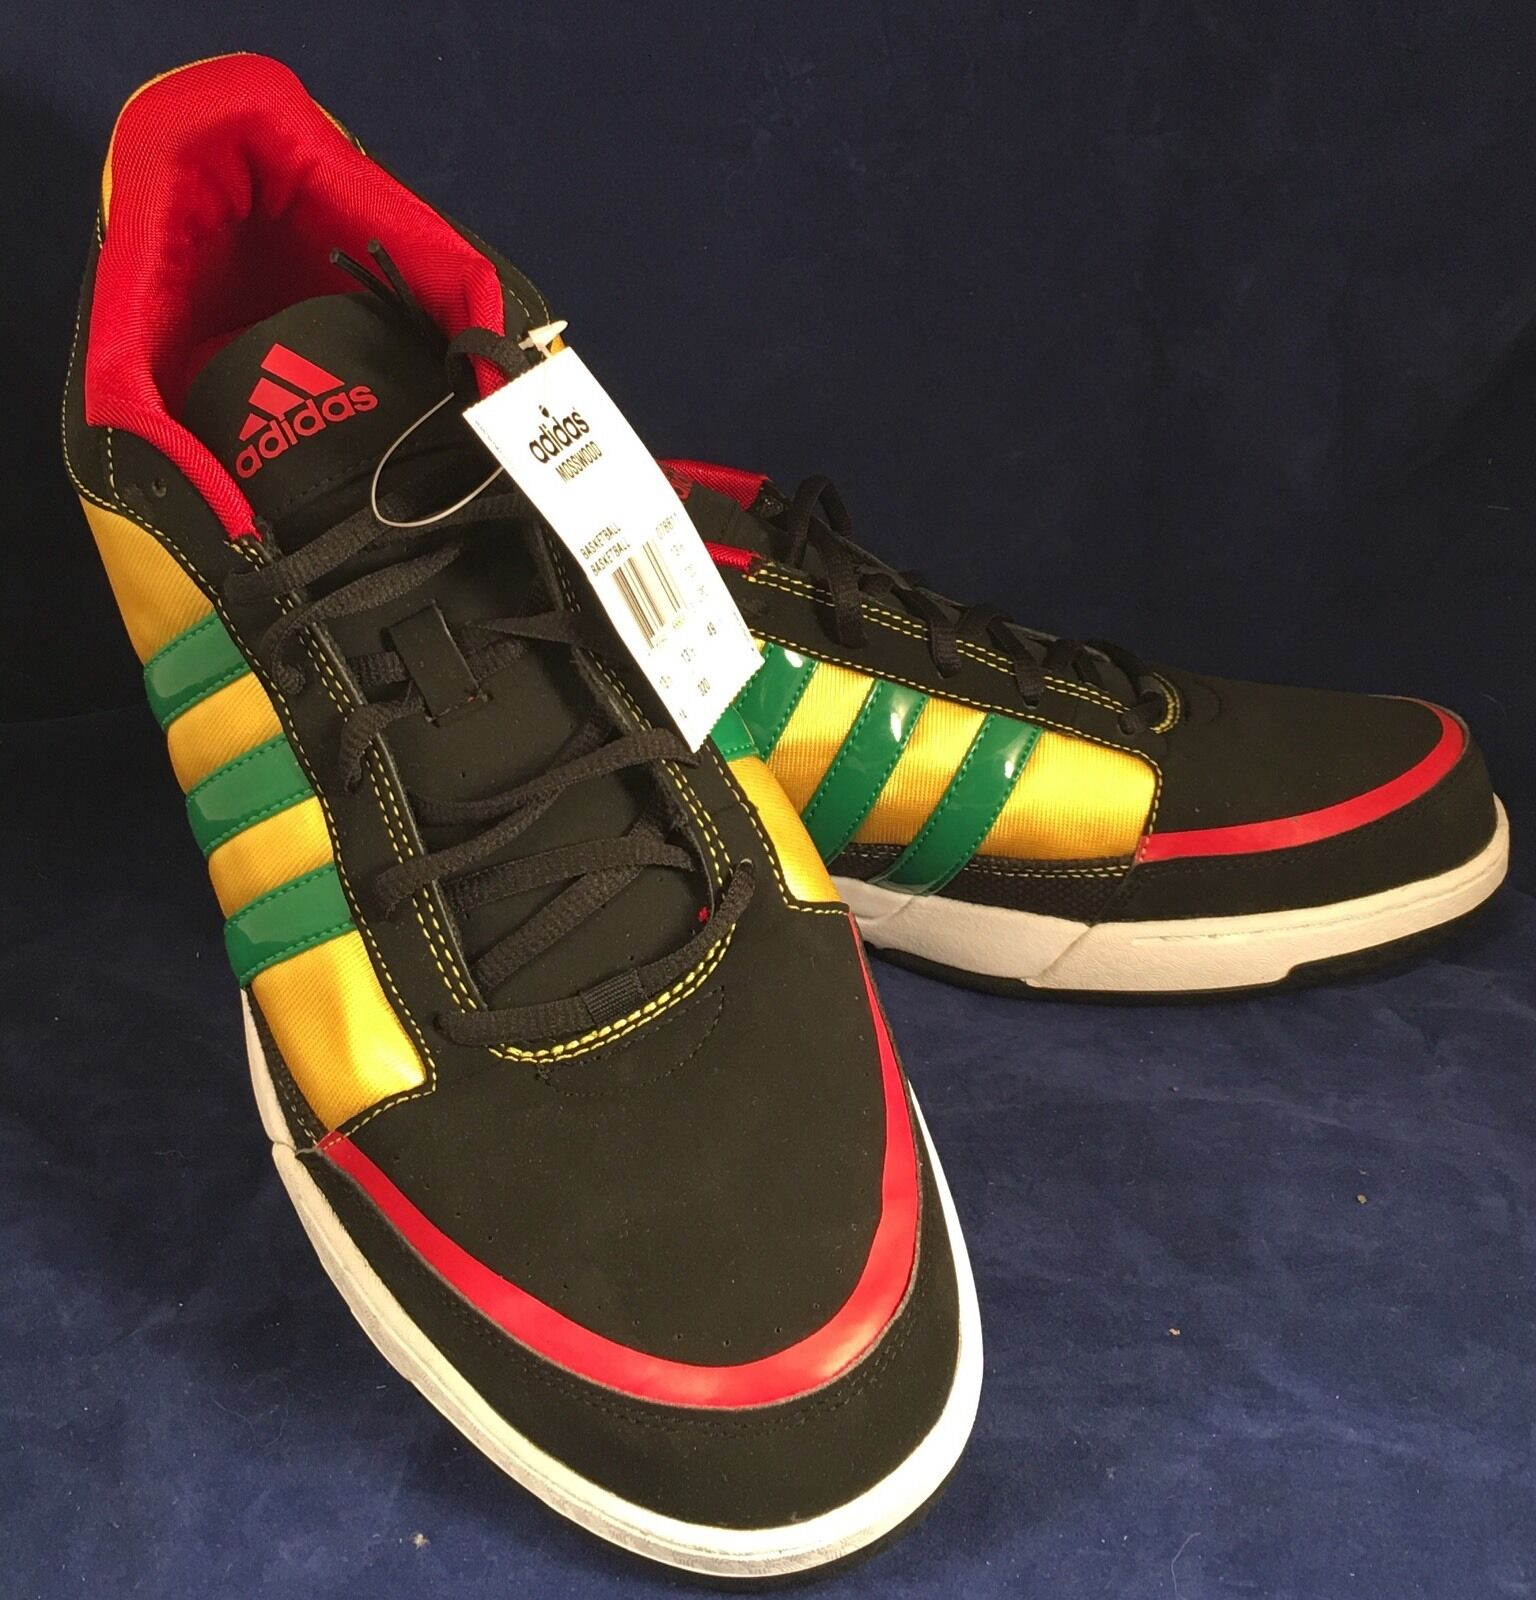 Adidas Mosswood Black/Yellow/Red/Green/White Men's US 14